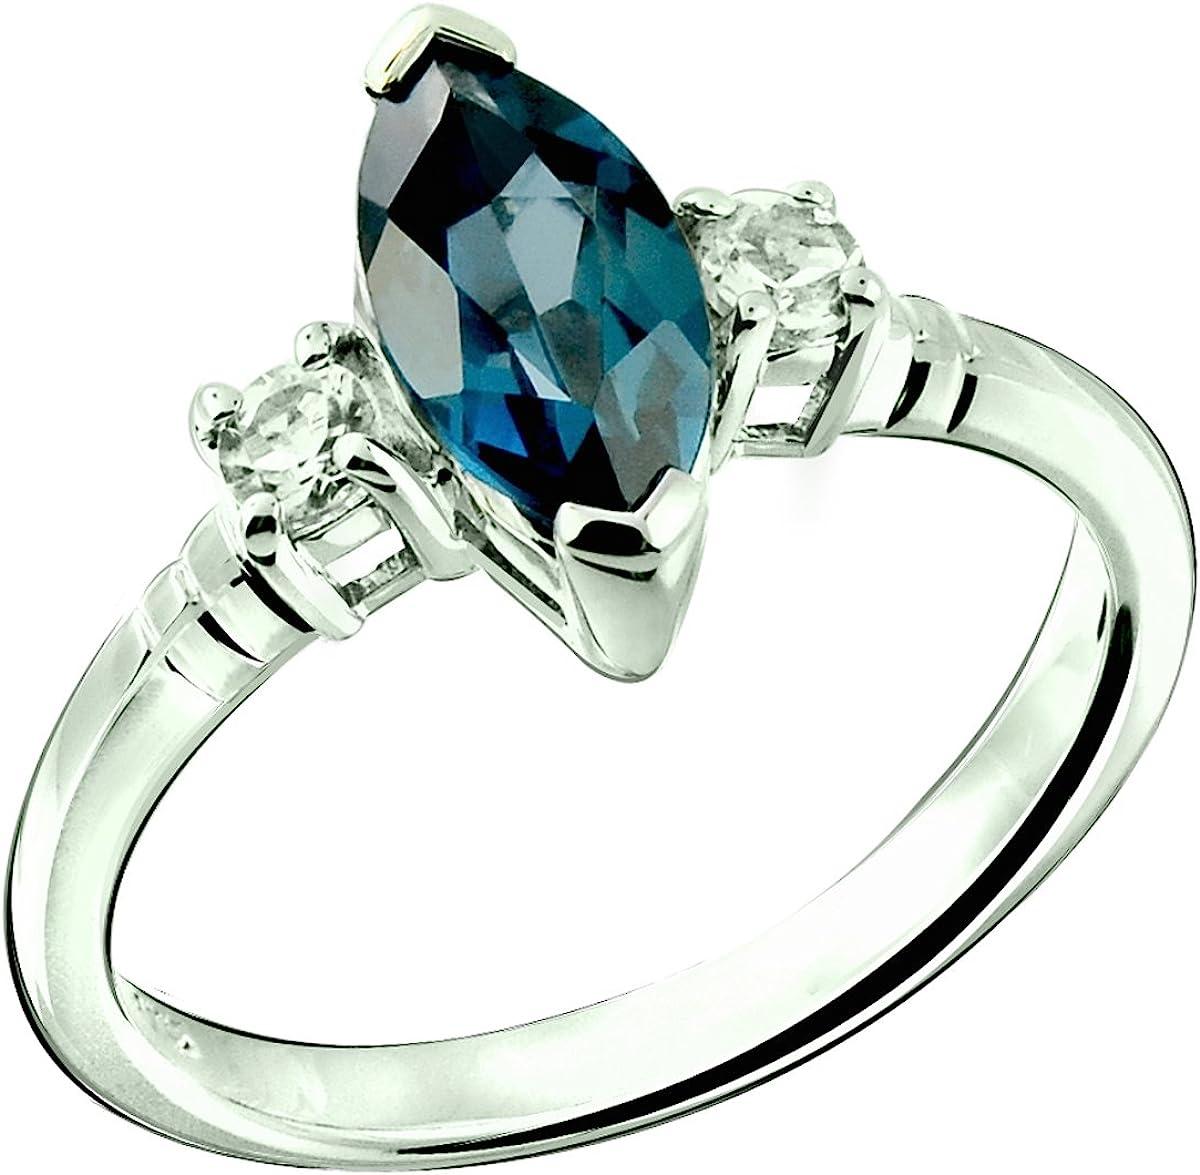 Appealing London Blue Topaz Gemstone 925 Sterling Silver Handmade Ring All Size